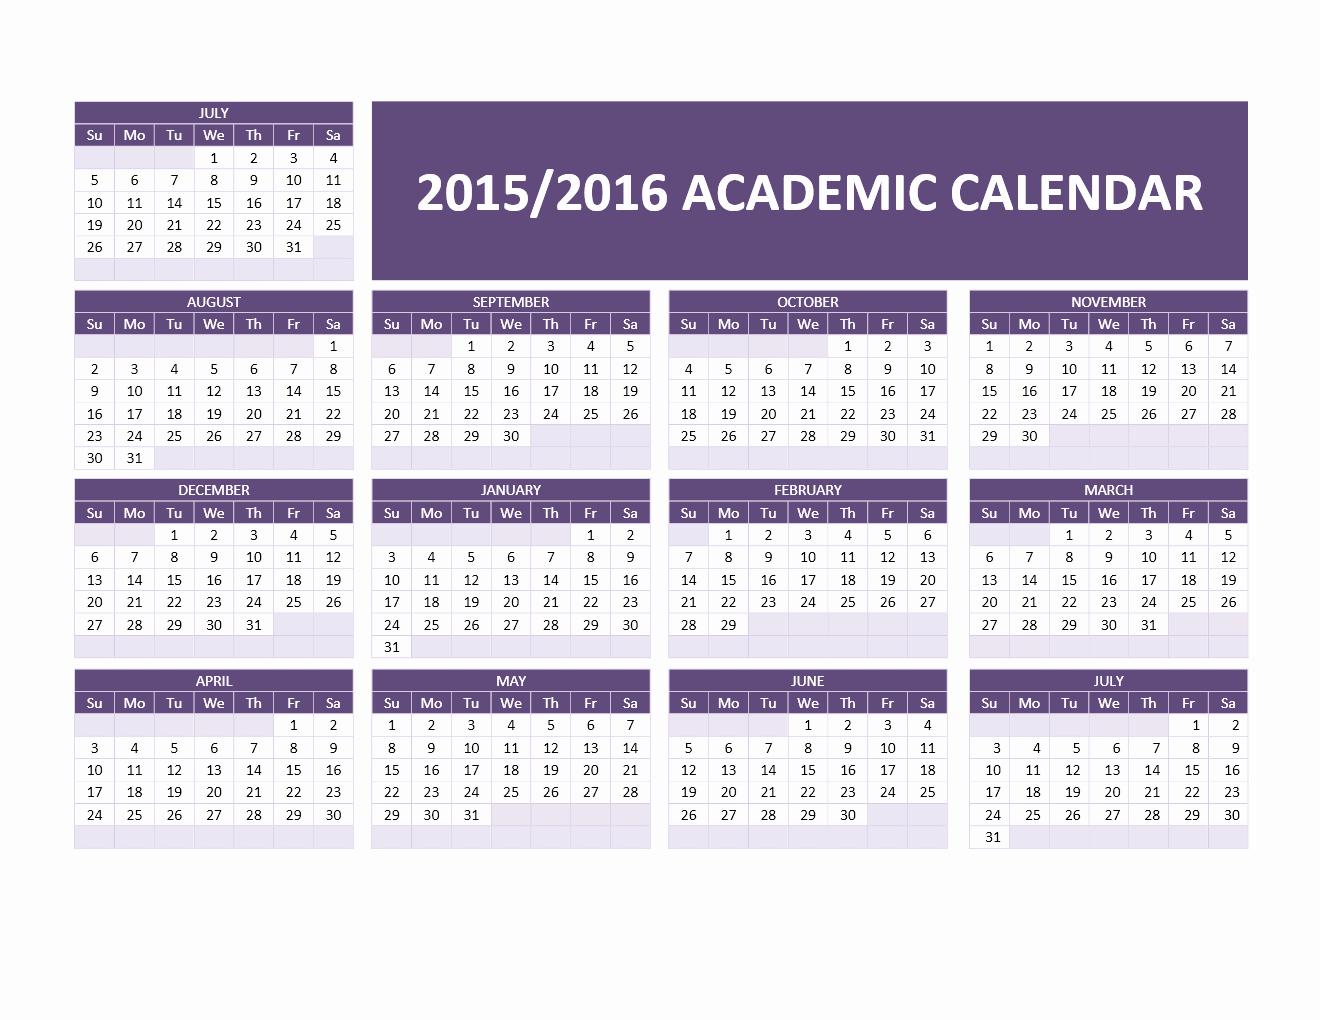 Fiscal Year Calendar 2016 Template New 2015 2016 Academic Calendar Templates